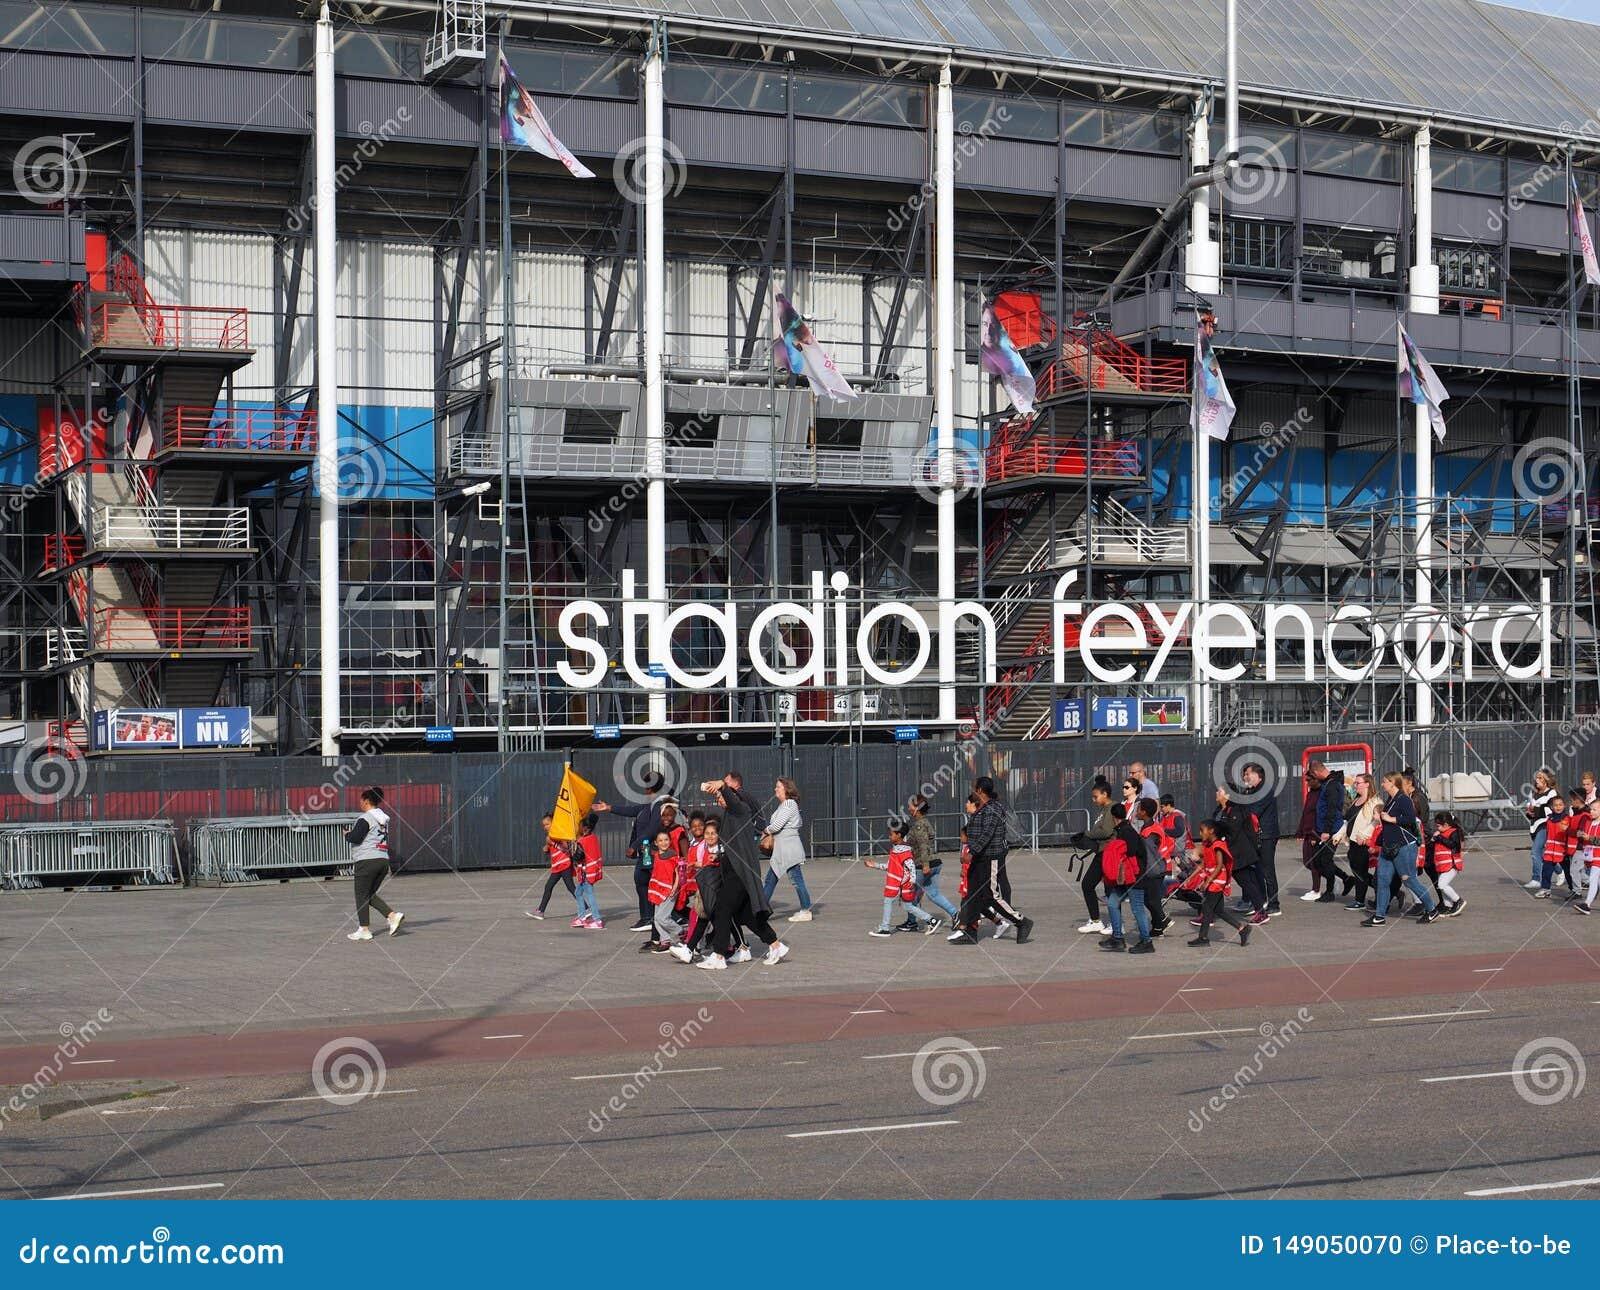 Feyenoord Stadium De Kuip In Rotterdam Netherlands Editorial Image Image Of Soccer Sport 149050070